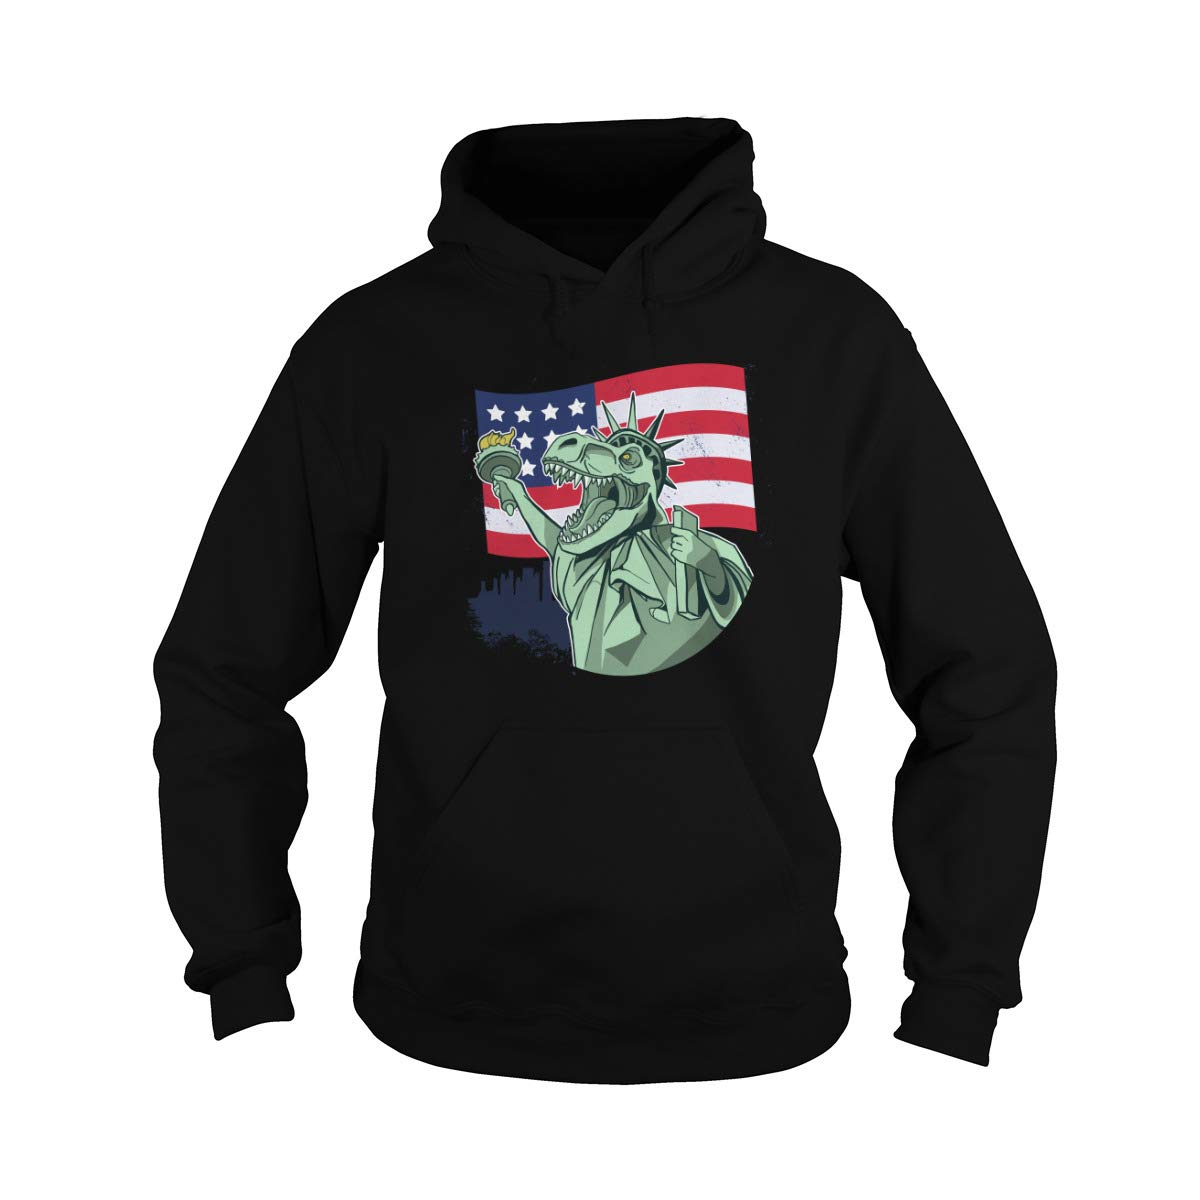 LibertyRex T-rex Lady Liberty Celebrating American Freedom Adult Hooded Sweatshirt